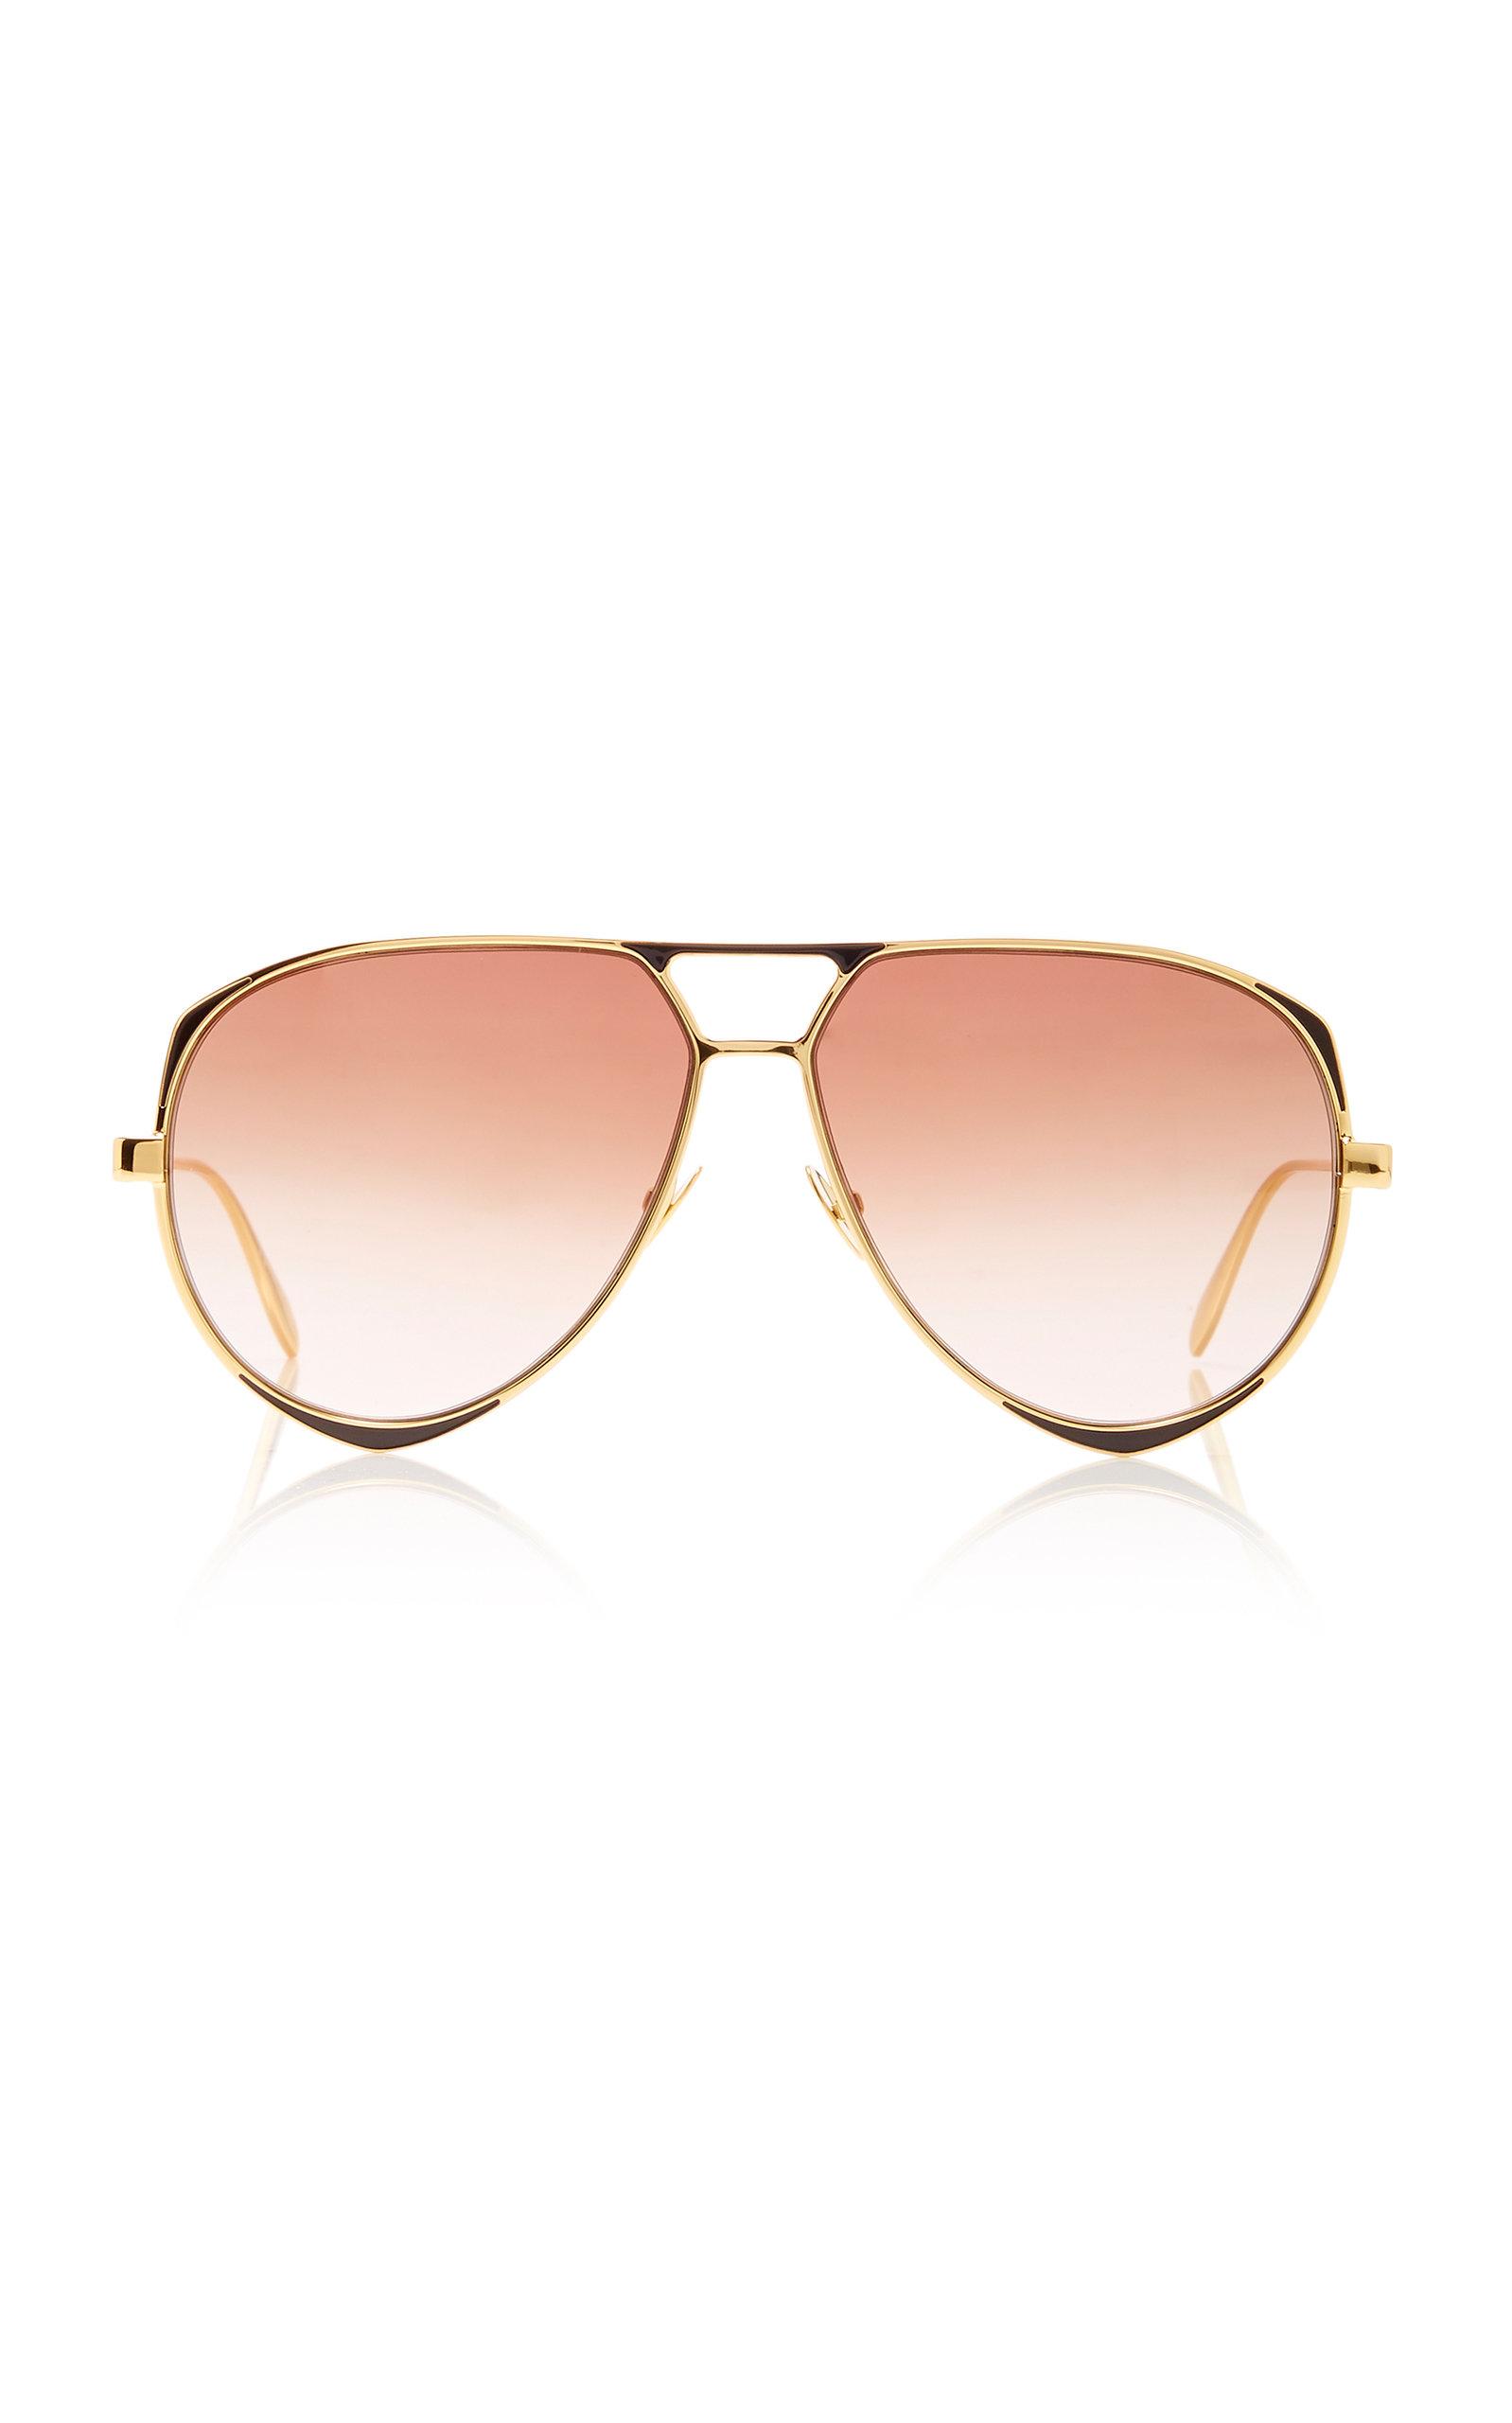 ALEXANDER MCQUEEN | Alexander McQueen Sunglasses Gold-Tone Metal Aviator Sunglasses | Goxip